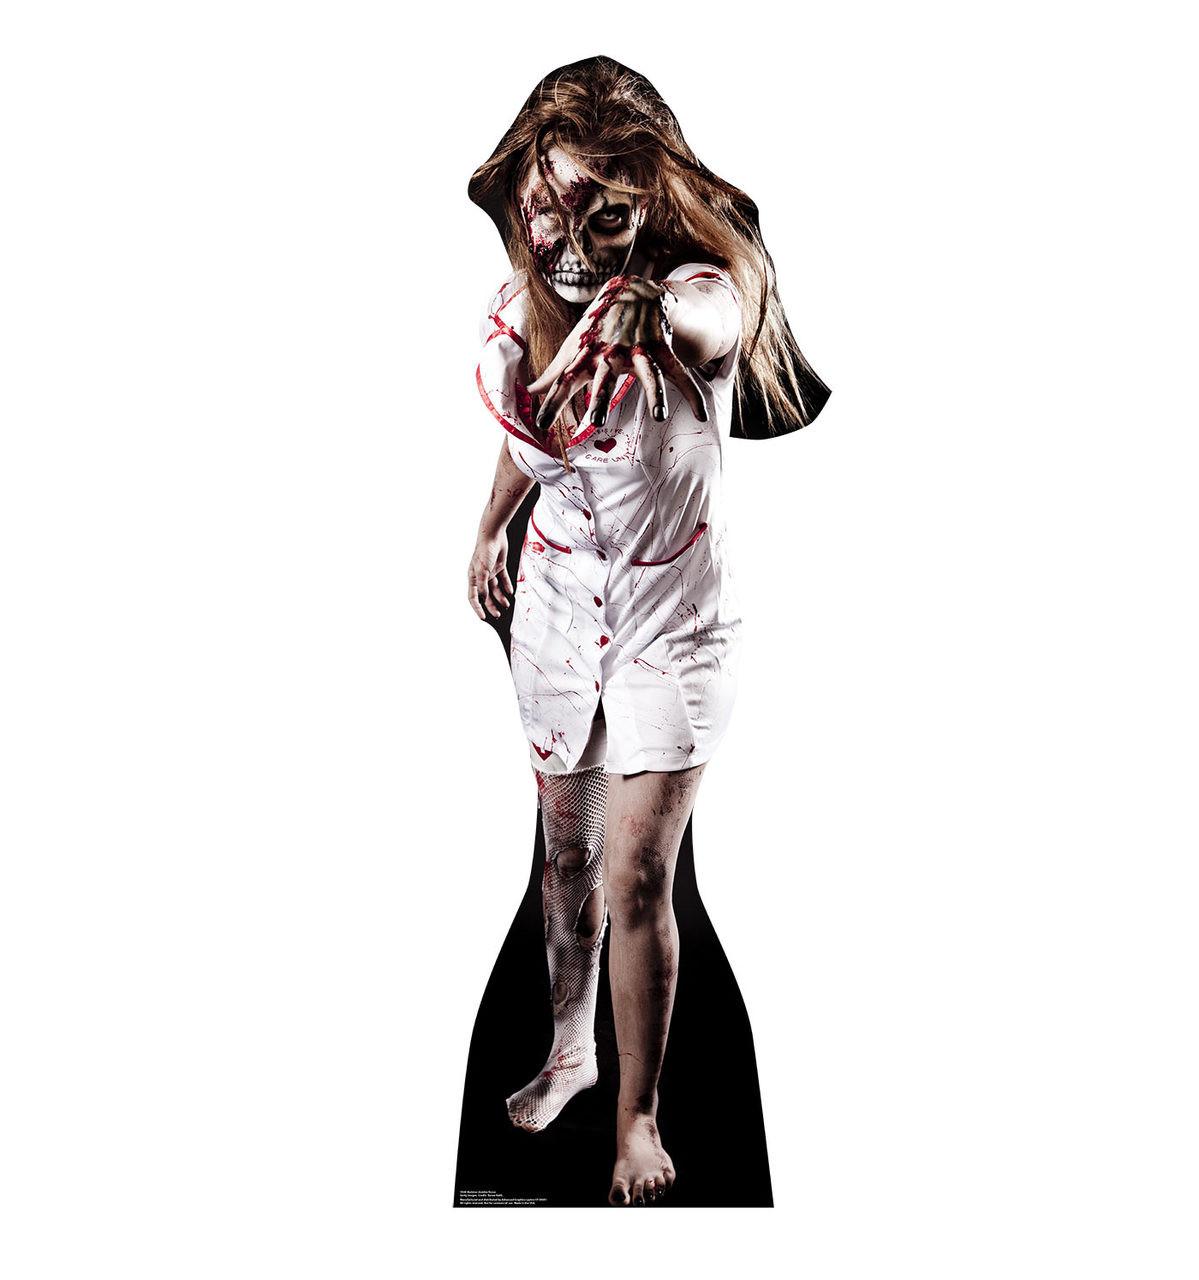 Life-size Skeleton Zombie Nurse Cardboard Standup 2